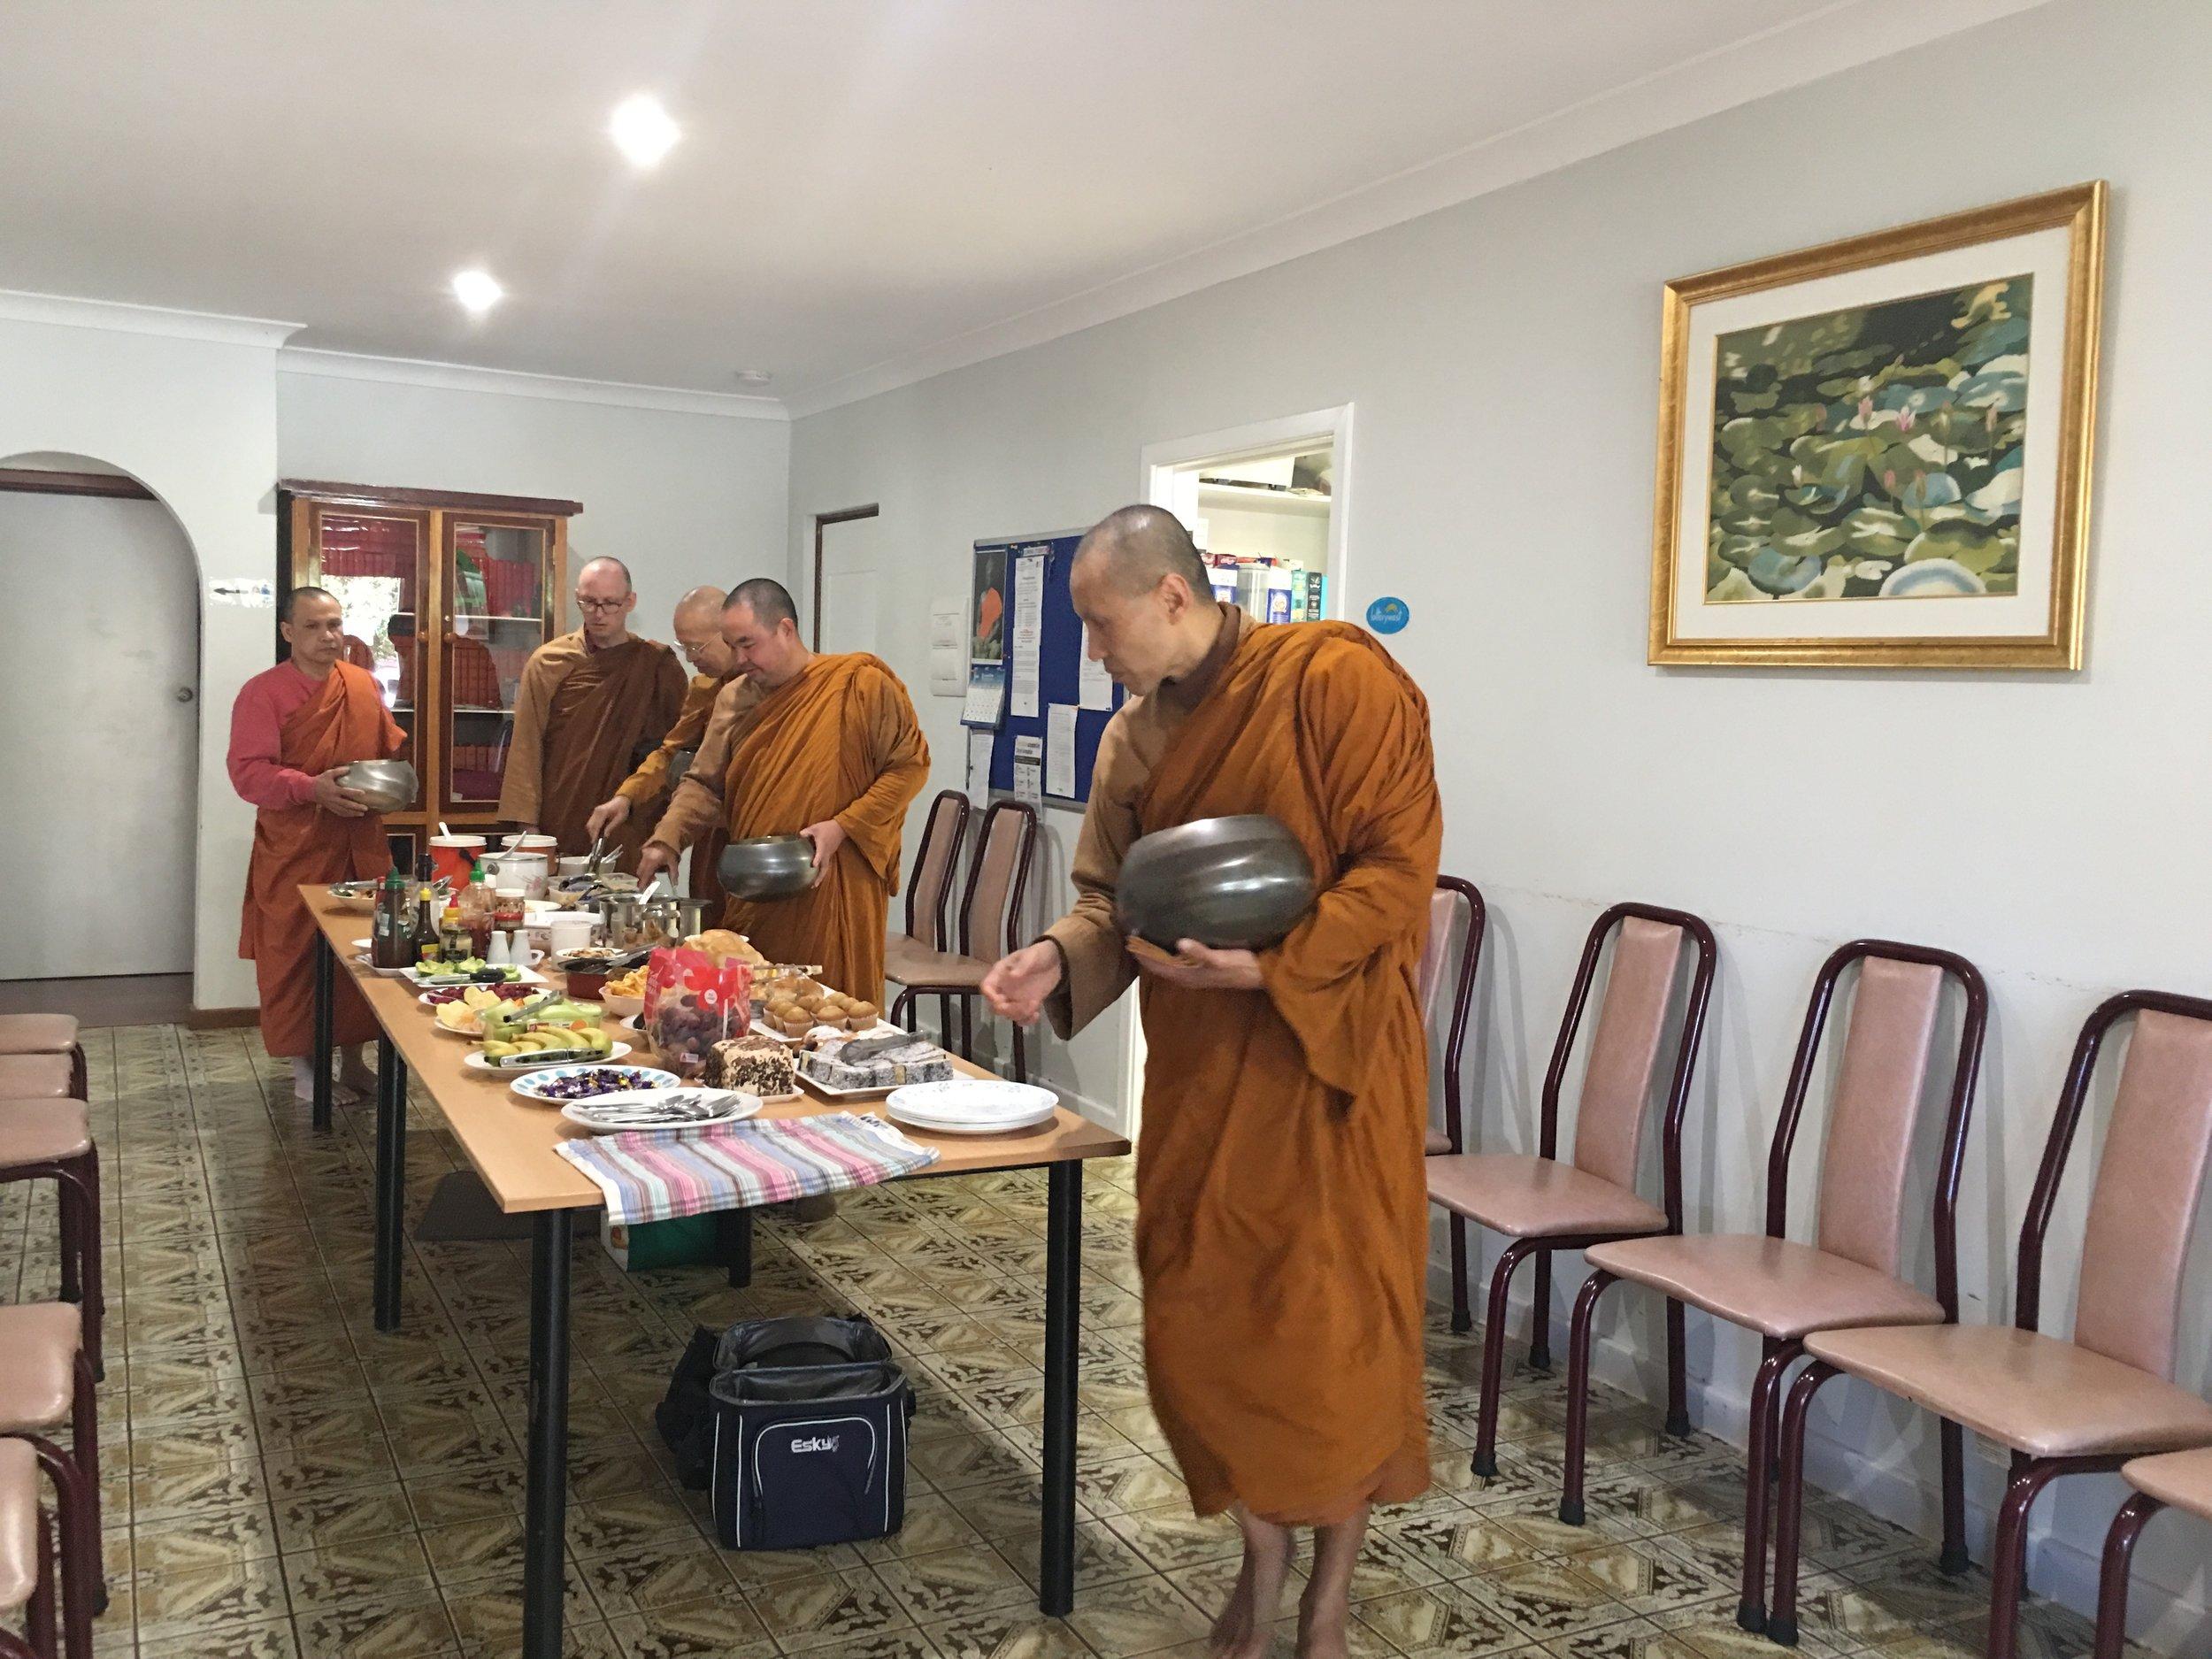 Monks taking dana in the Dining Room.